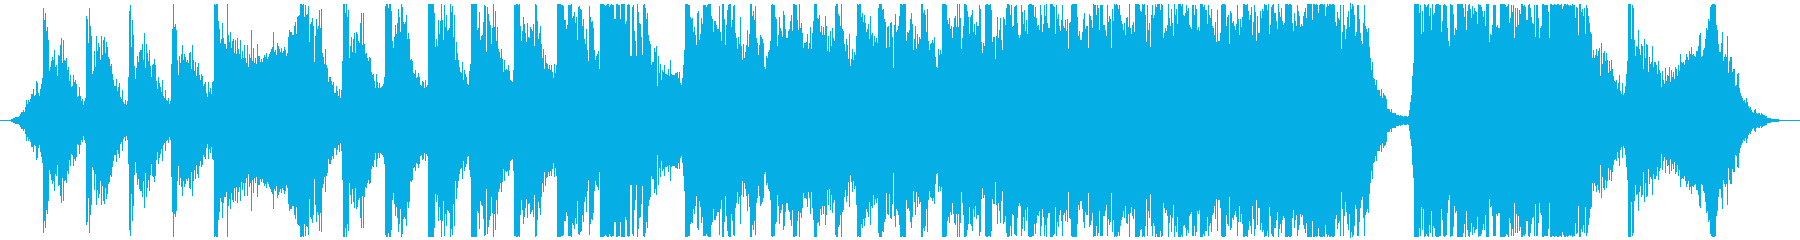 Intense Musicの再生済みの波形